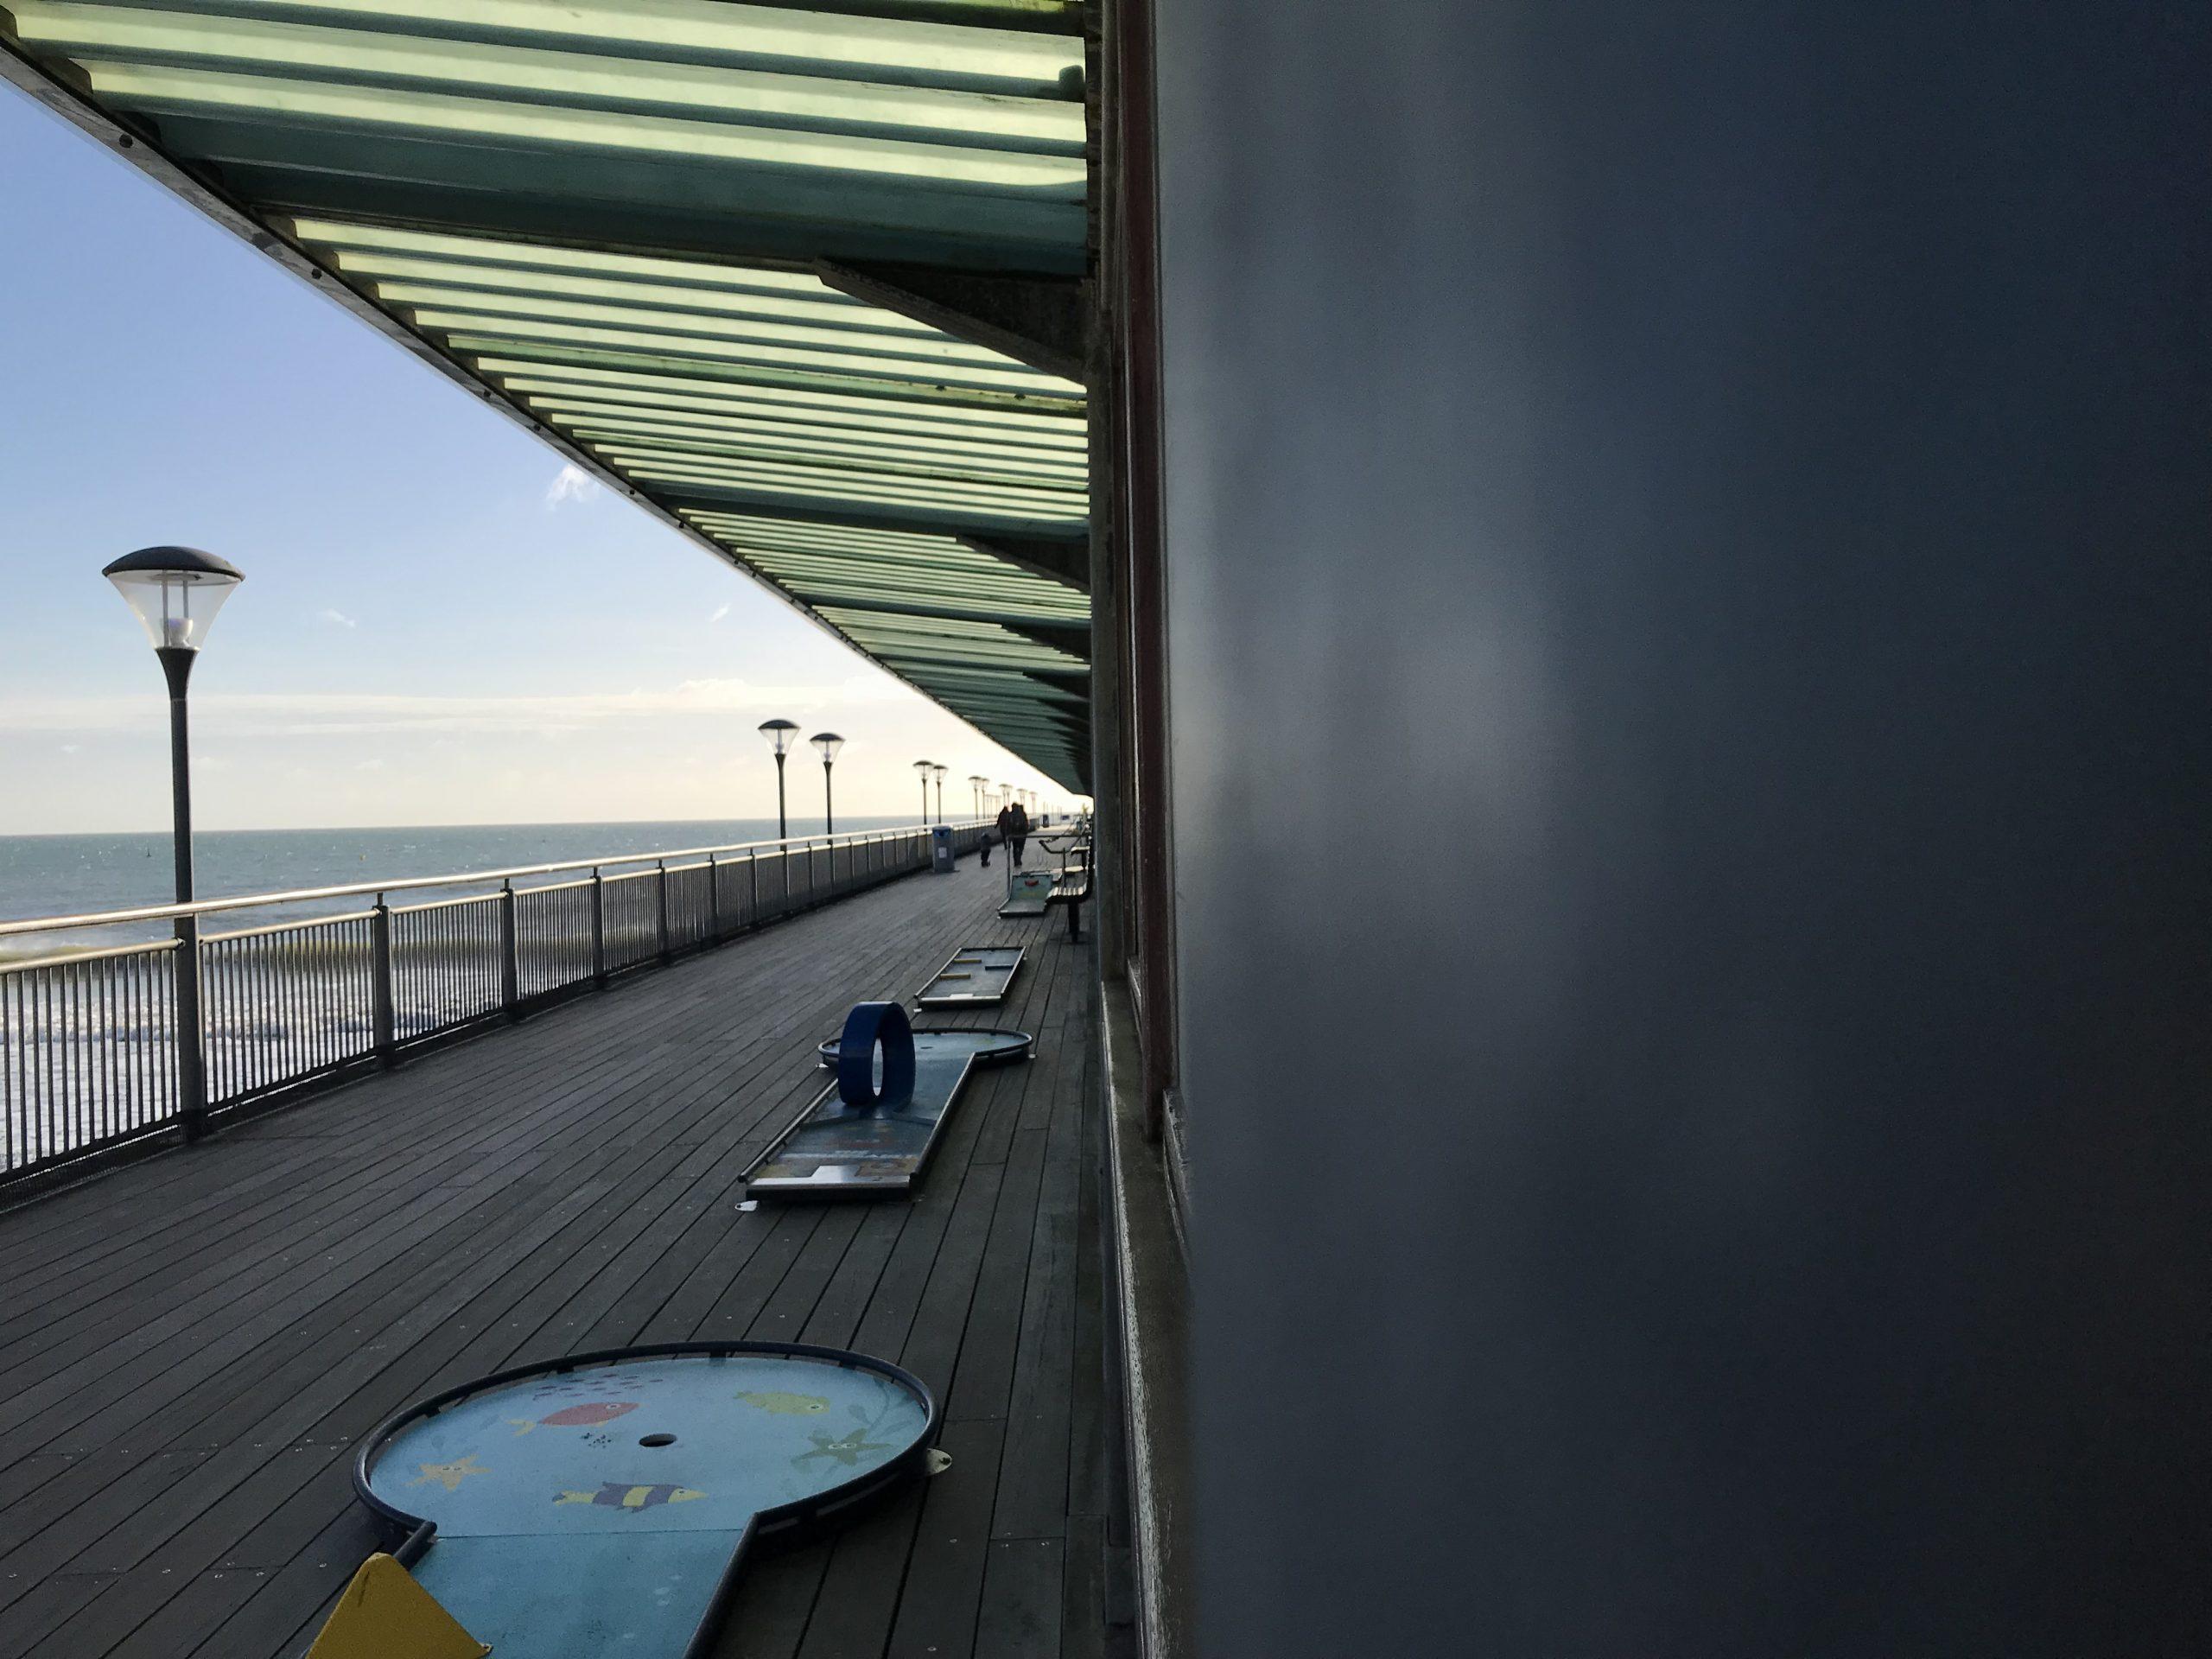 Boscombe pier golf